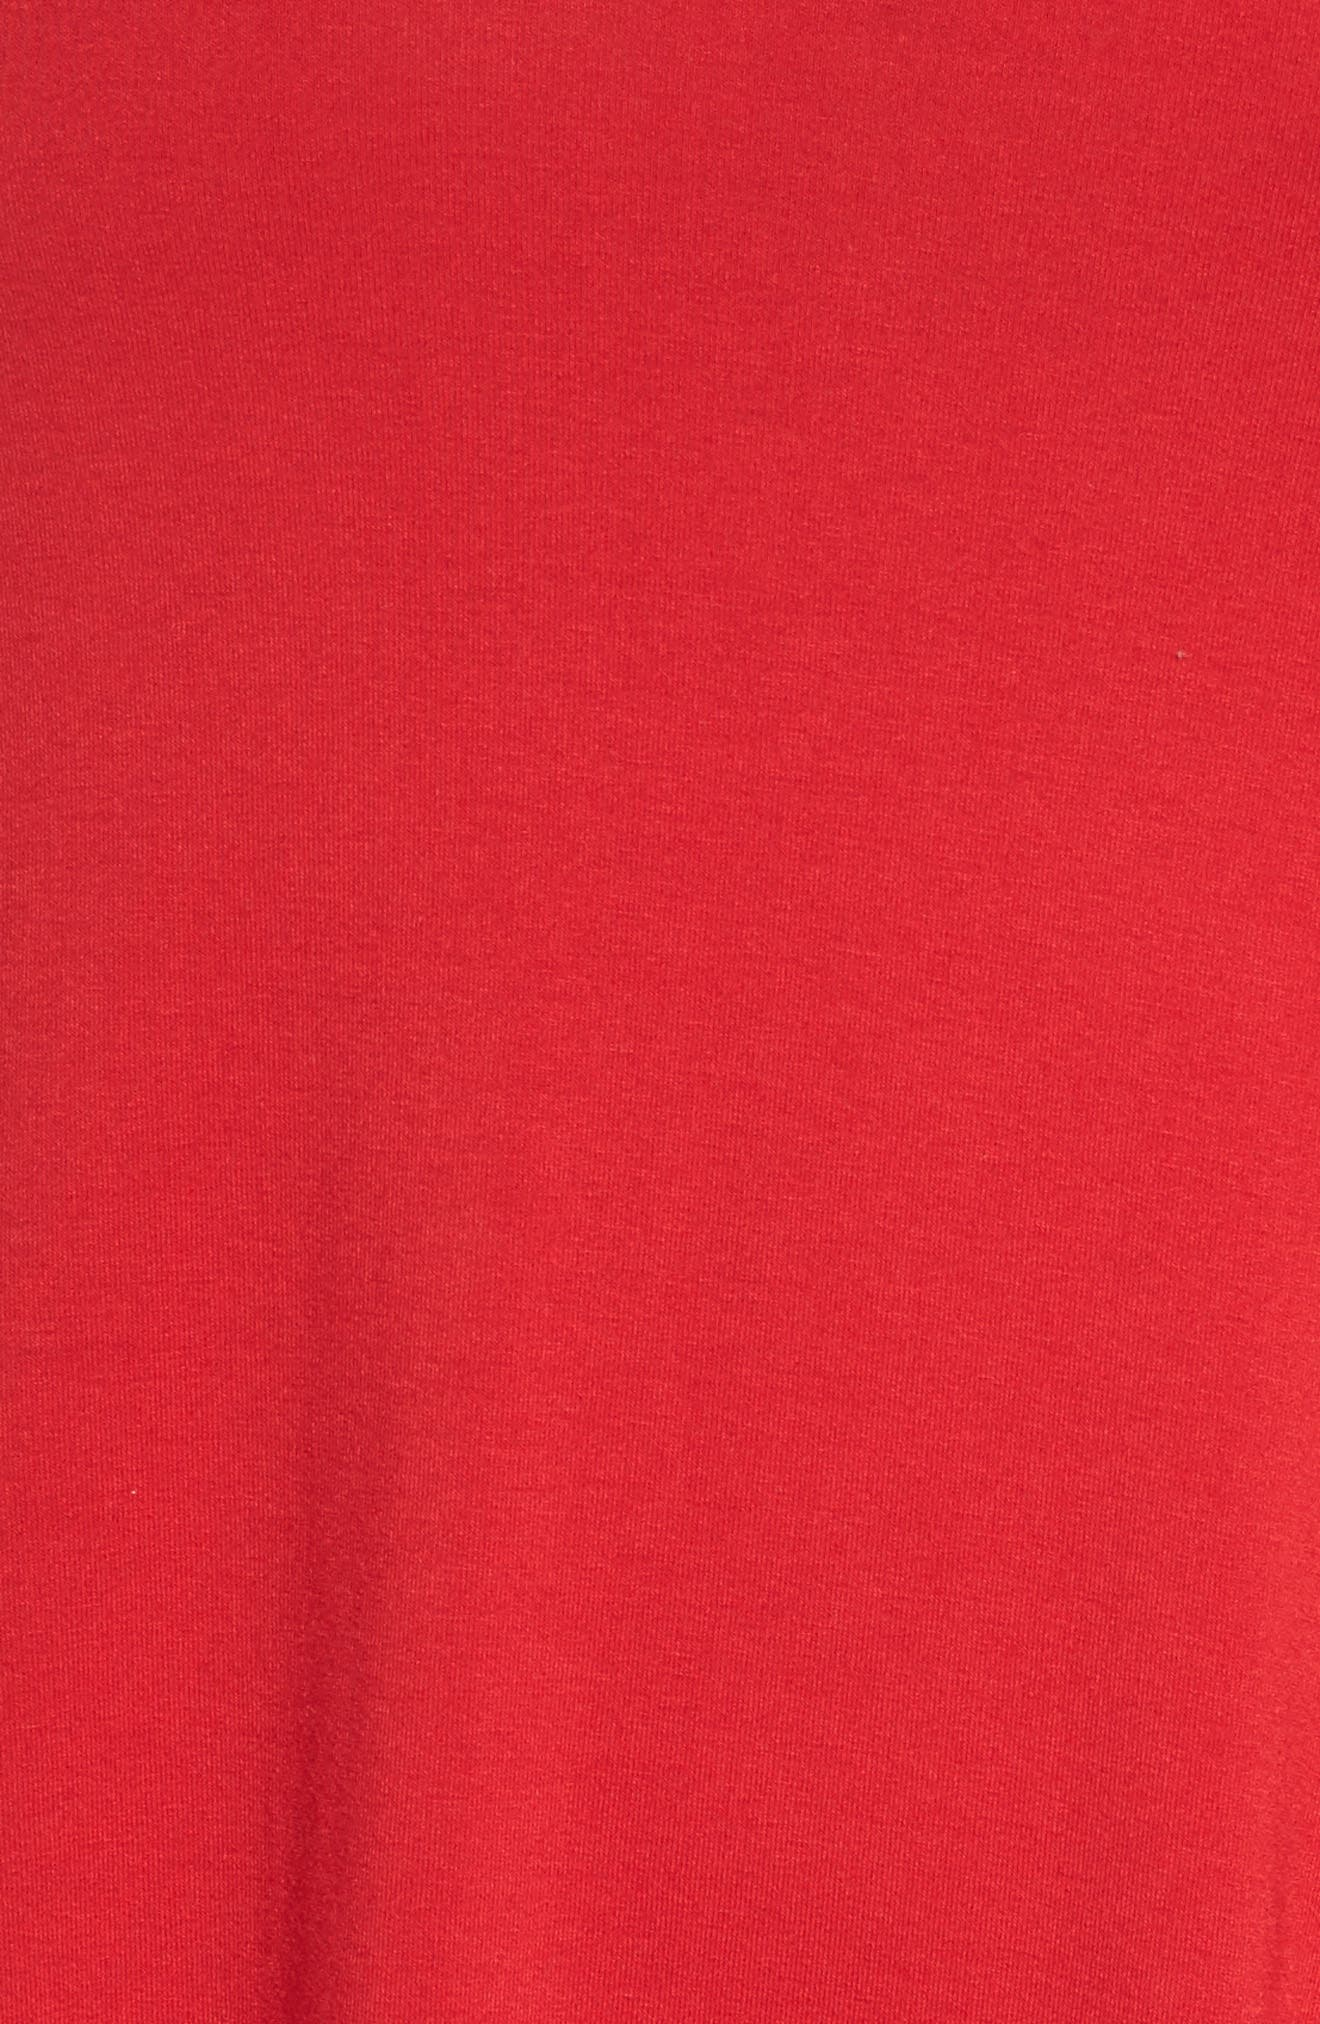 Tulip Sleeve Shift Dress,                             Alternate thumbnail 5, color,                             Red